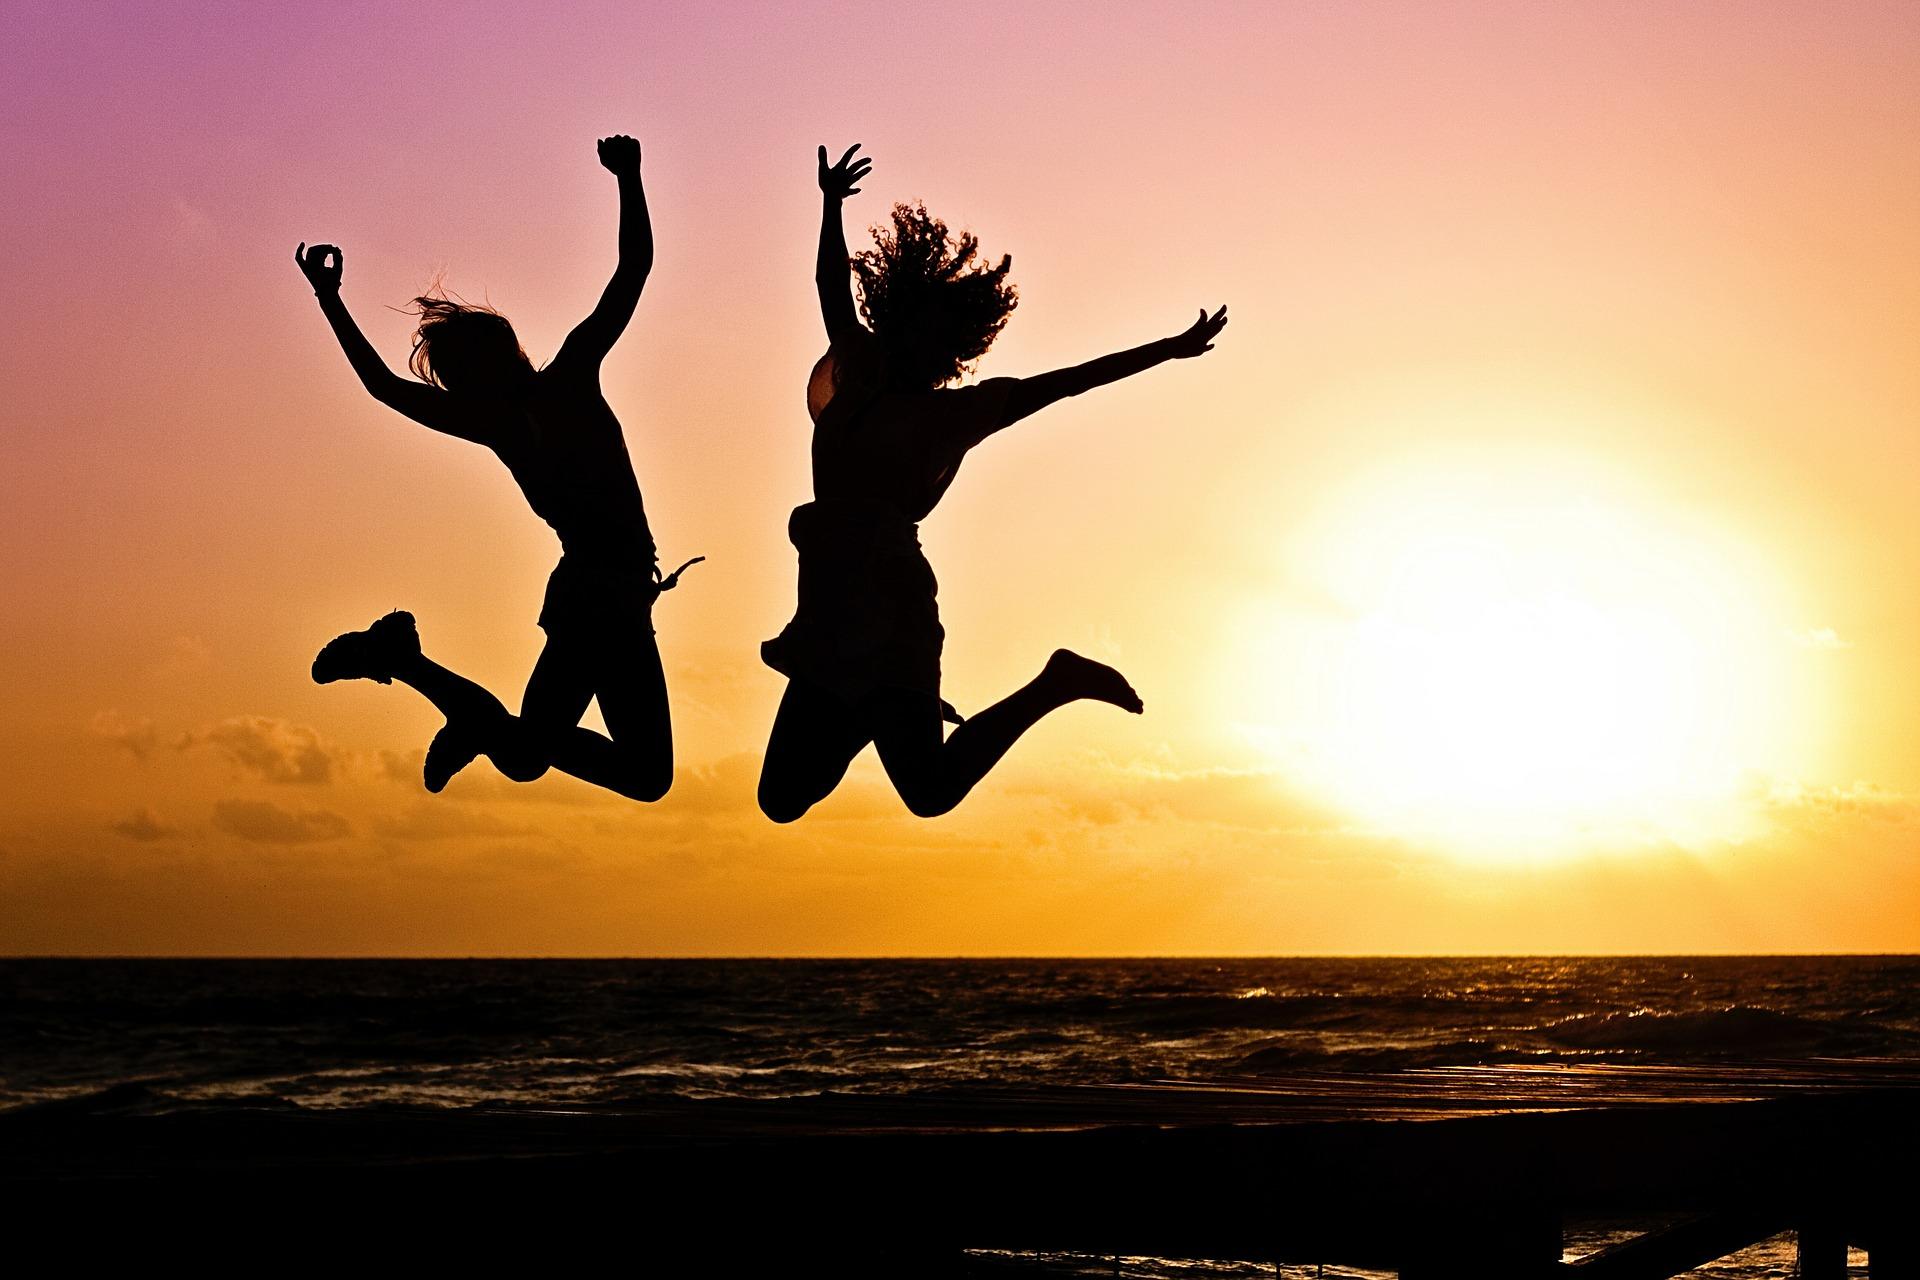 dove vivere felici: 3 paesi più felici al mondo